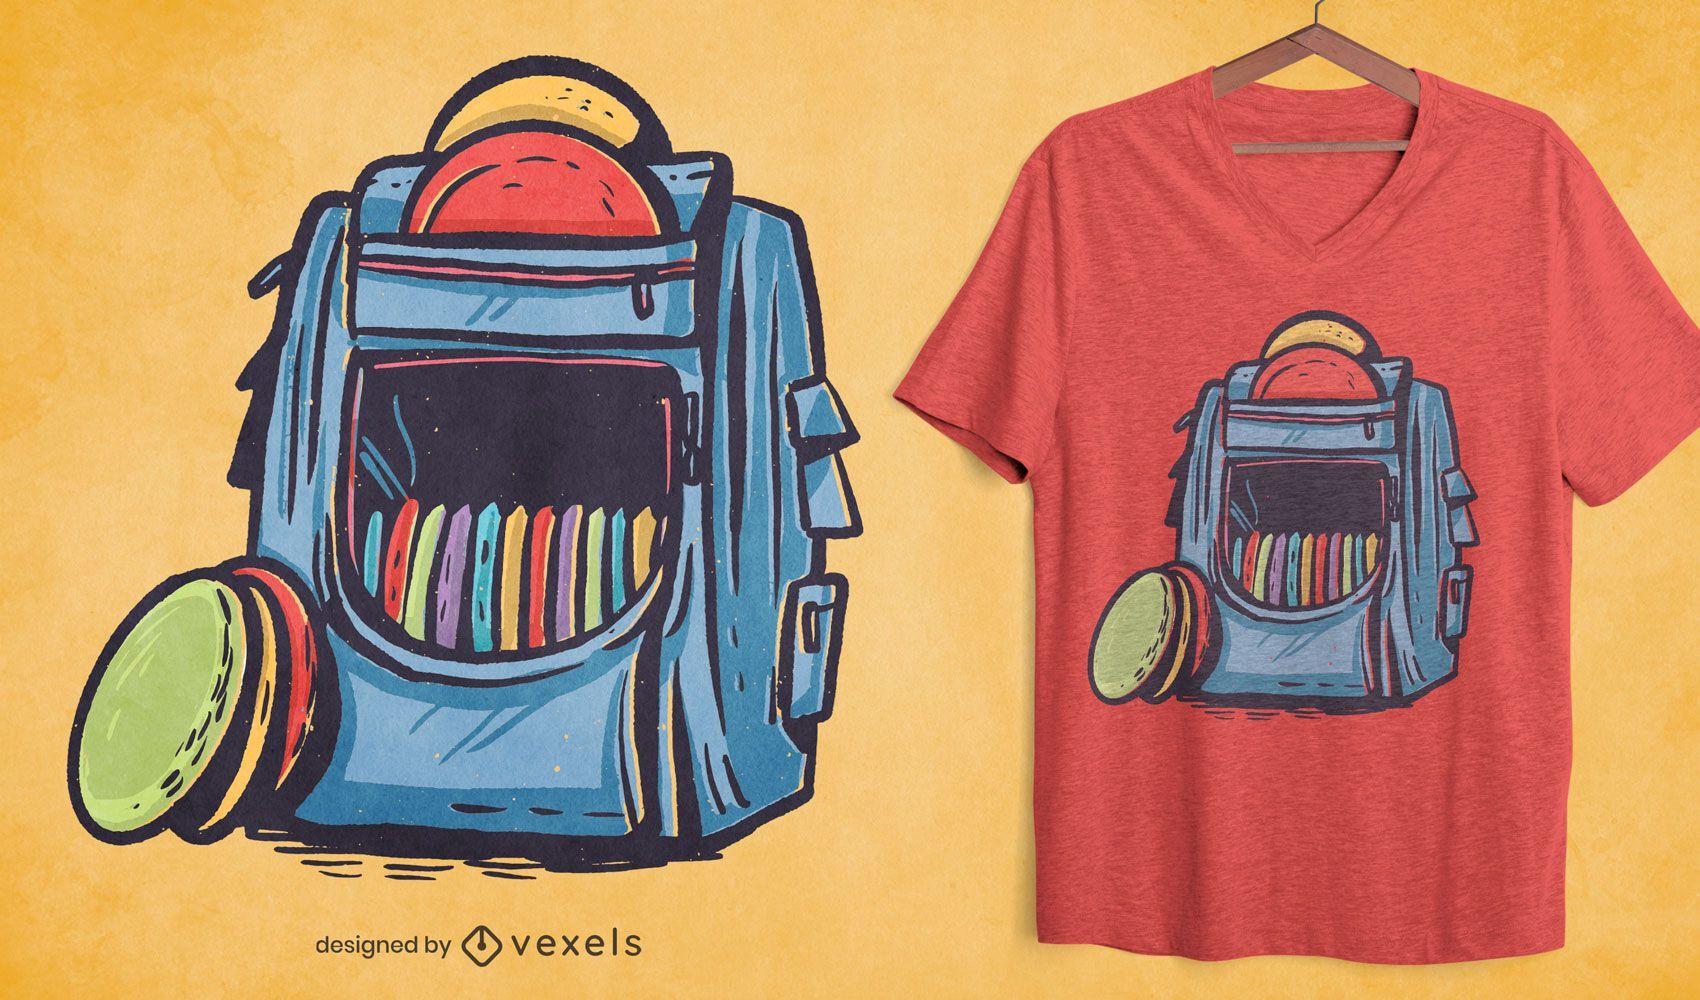 Disc golf bag comic t-shirt design